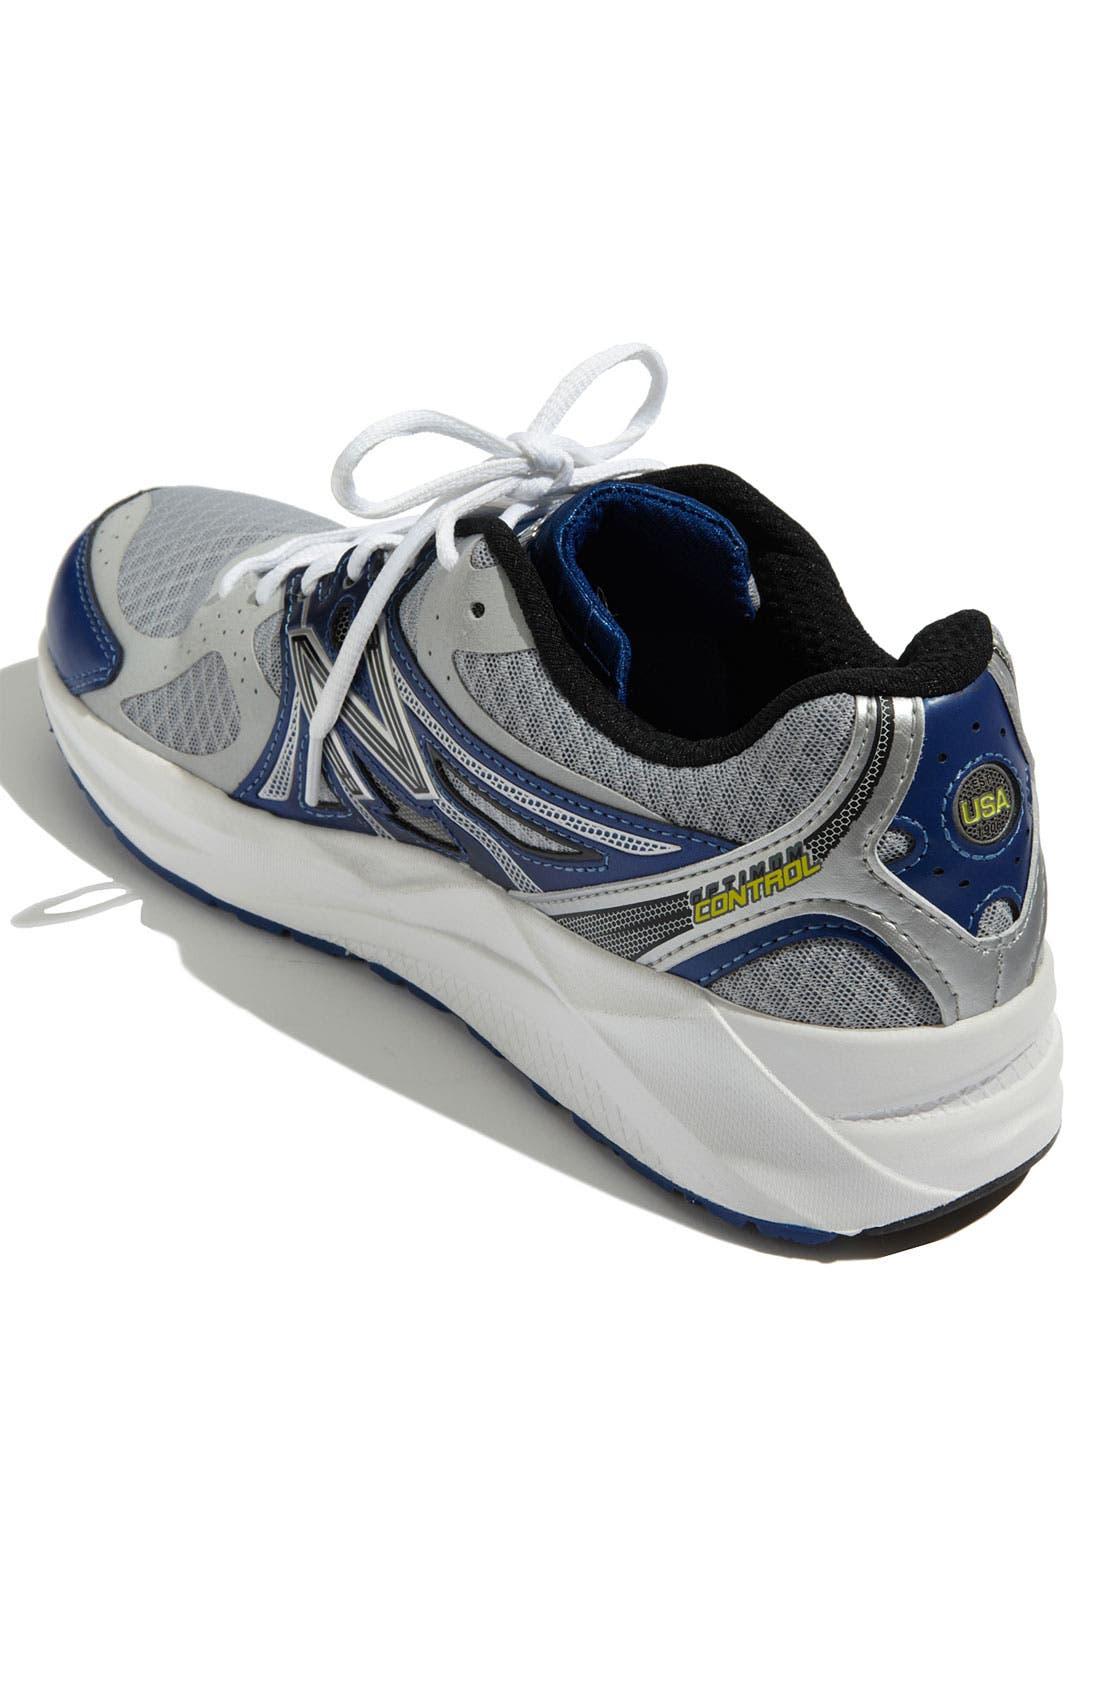 Alternate Image 2  - New Balance '1140' Running Shoe (Men)